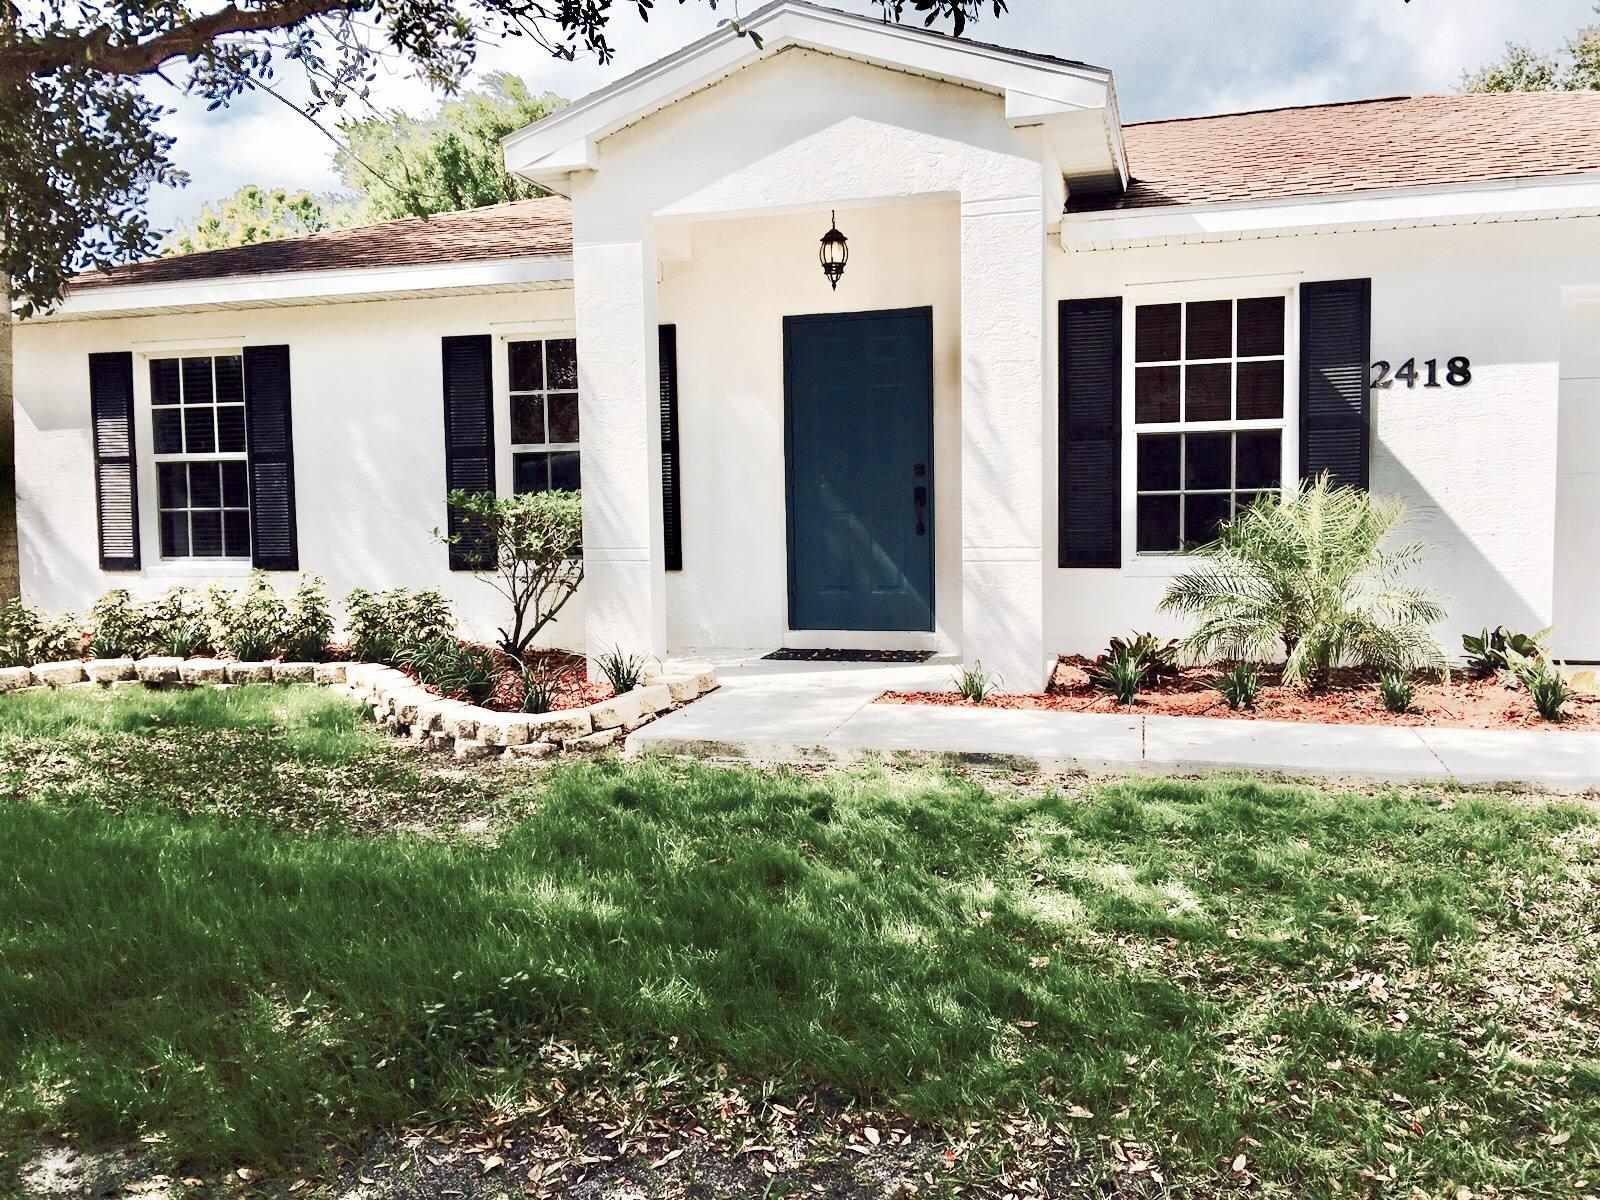 2418 Sw Carpenter Street, Port Saint Lucie, FL 34984